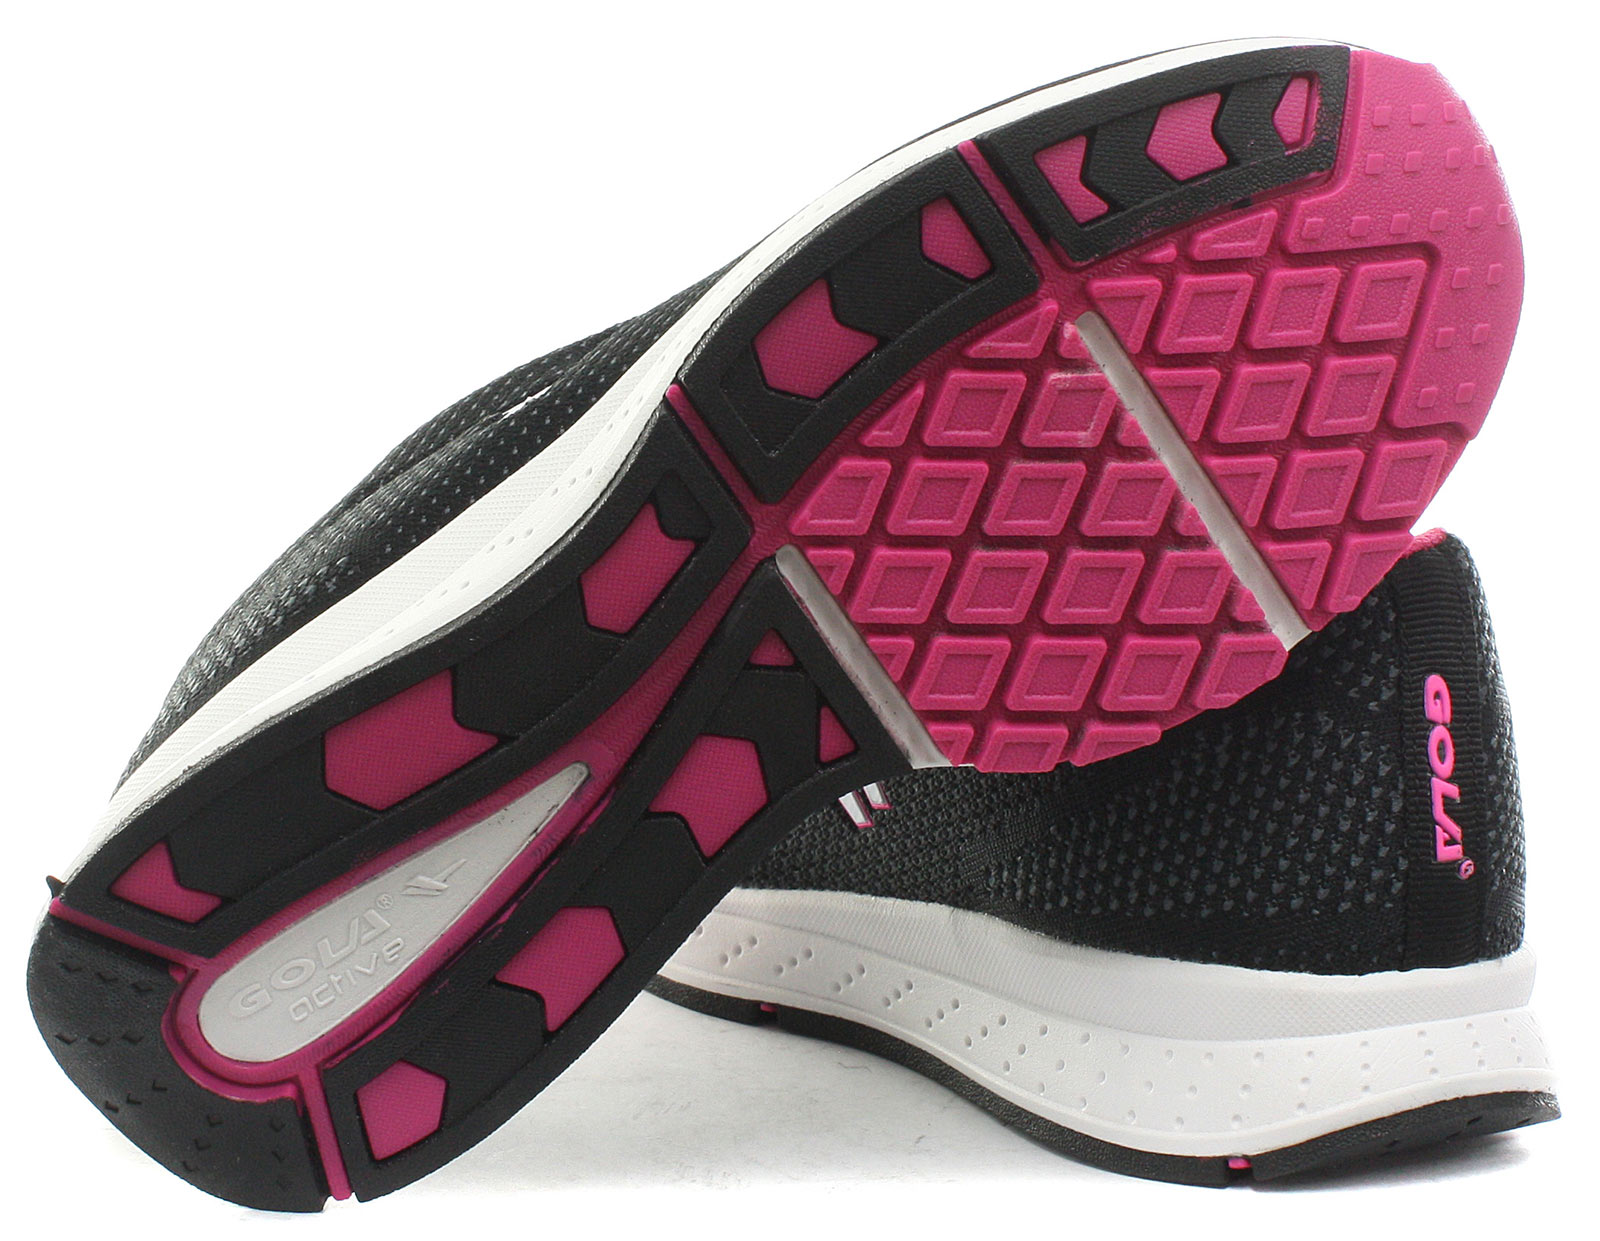 Da Taglie Active Le Gola Tutte Donna Trail 2 Nero Scarpe Zenith Corsa Shoes wYwTBqd7Px